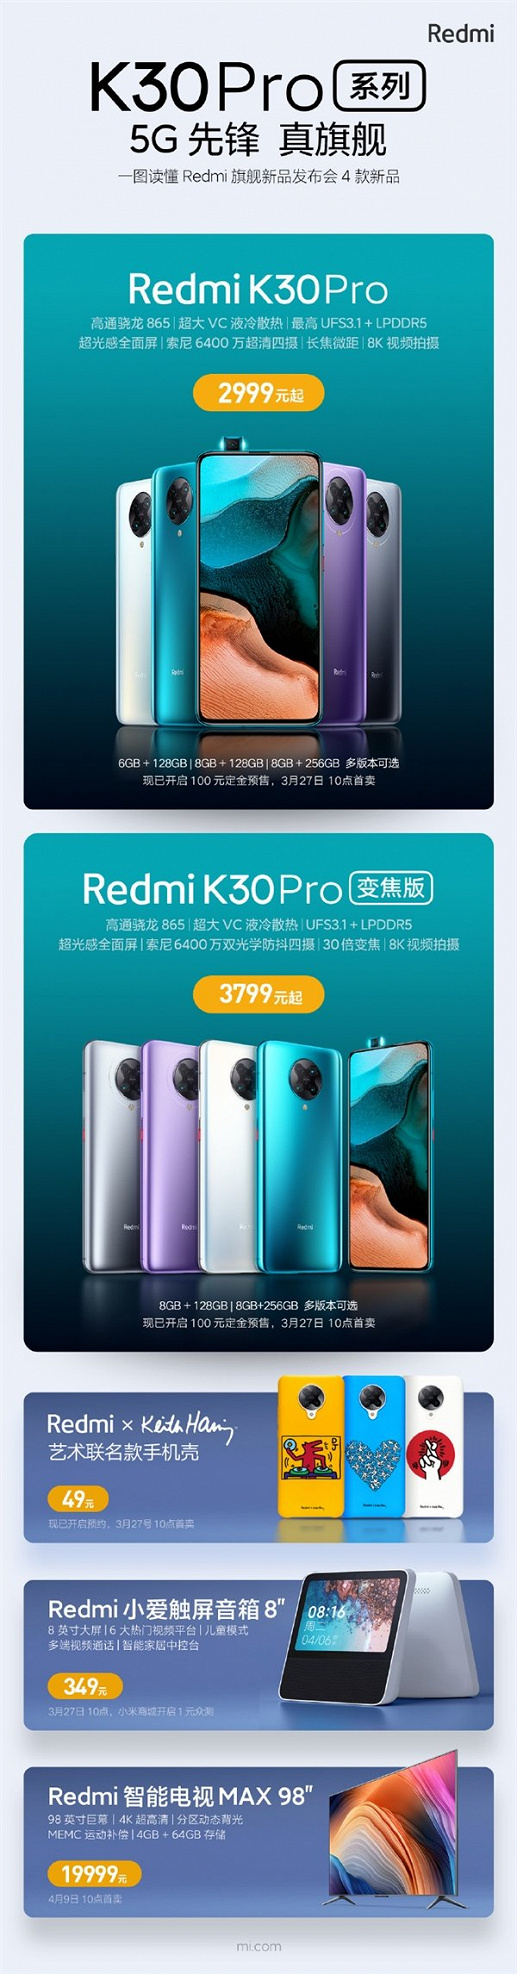 Даты выхода всех новинок Redmi в одном месте: Redmi K30 Pro, Redmi Max 98 и Redmi XiaoAI Touch Screen Speaker